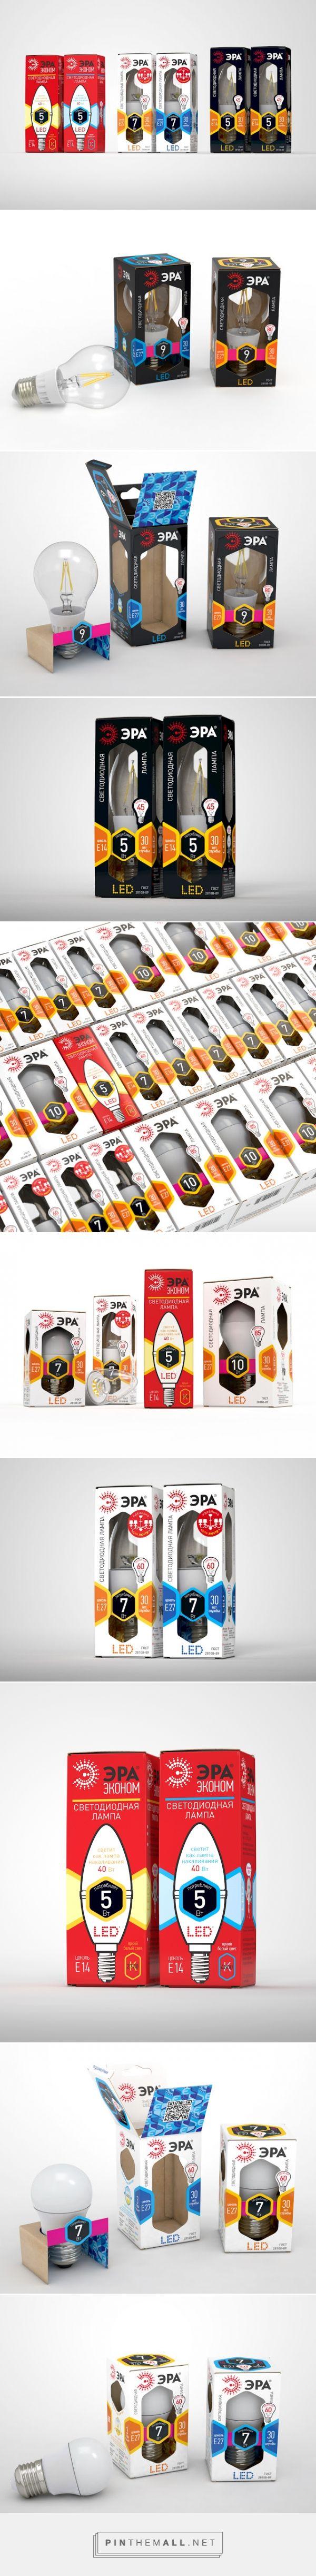 LED Bulbs ERA - Packaging of the World - Creative Package Design Gallery - http://www.packagingoftheworld.com/2016/02/led-bulbs-era.html